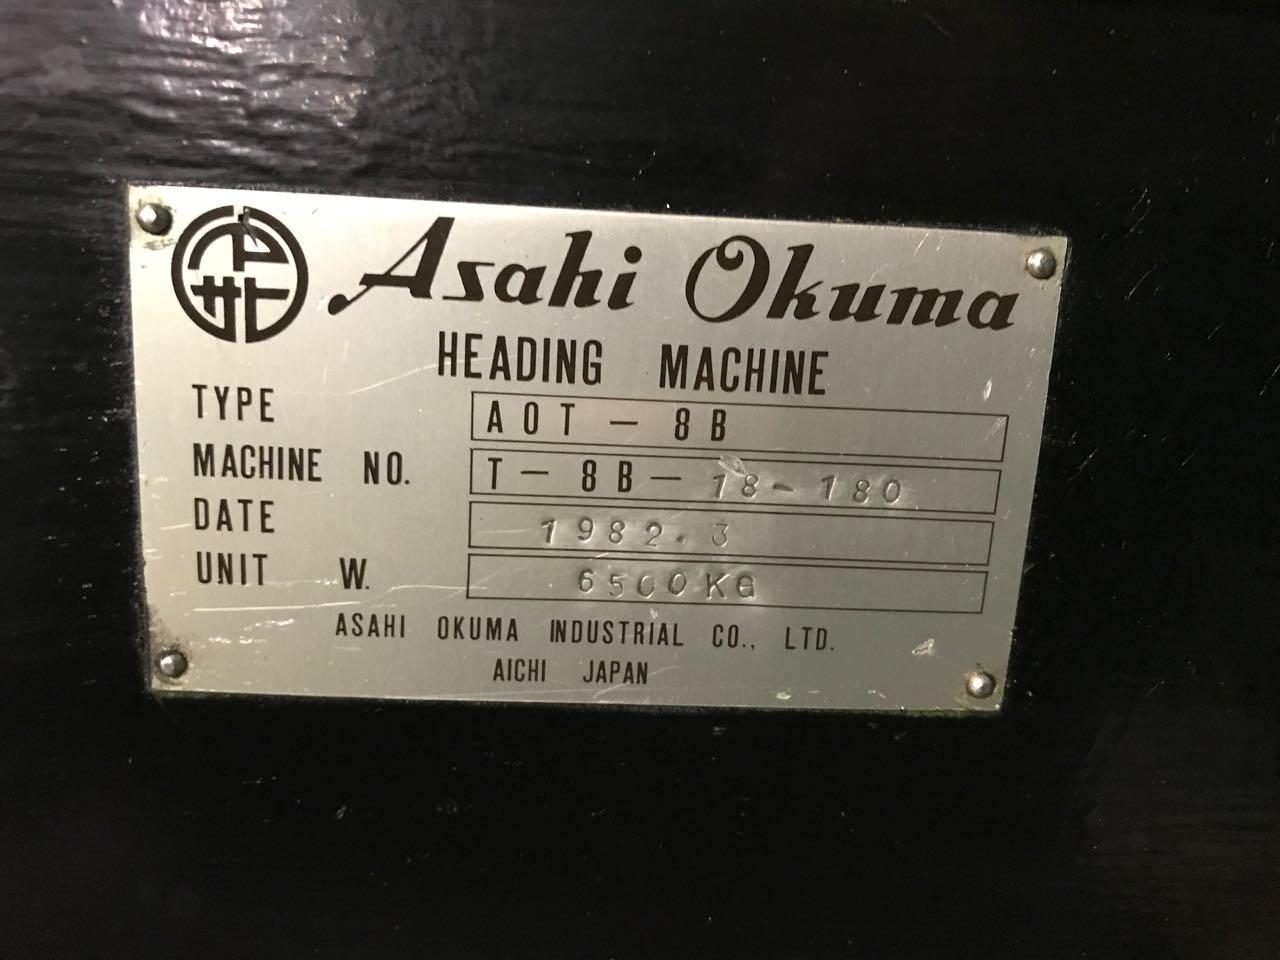 "5/16"" Asahi Okuma Model AOT-8B High Speed 2 Die 2 Blow Cold Header"